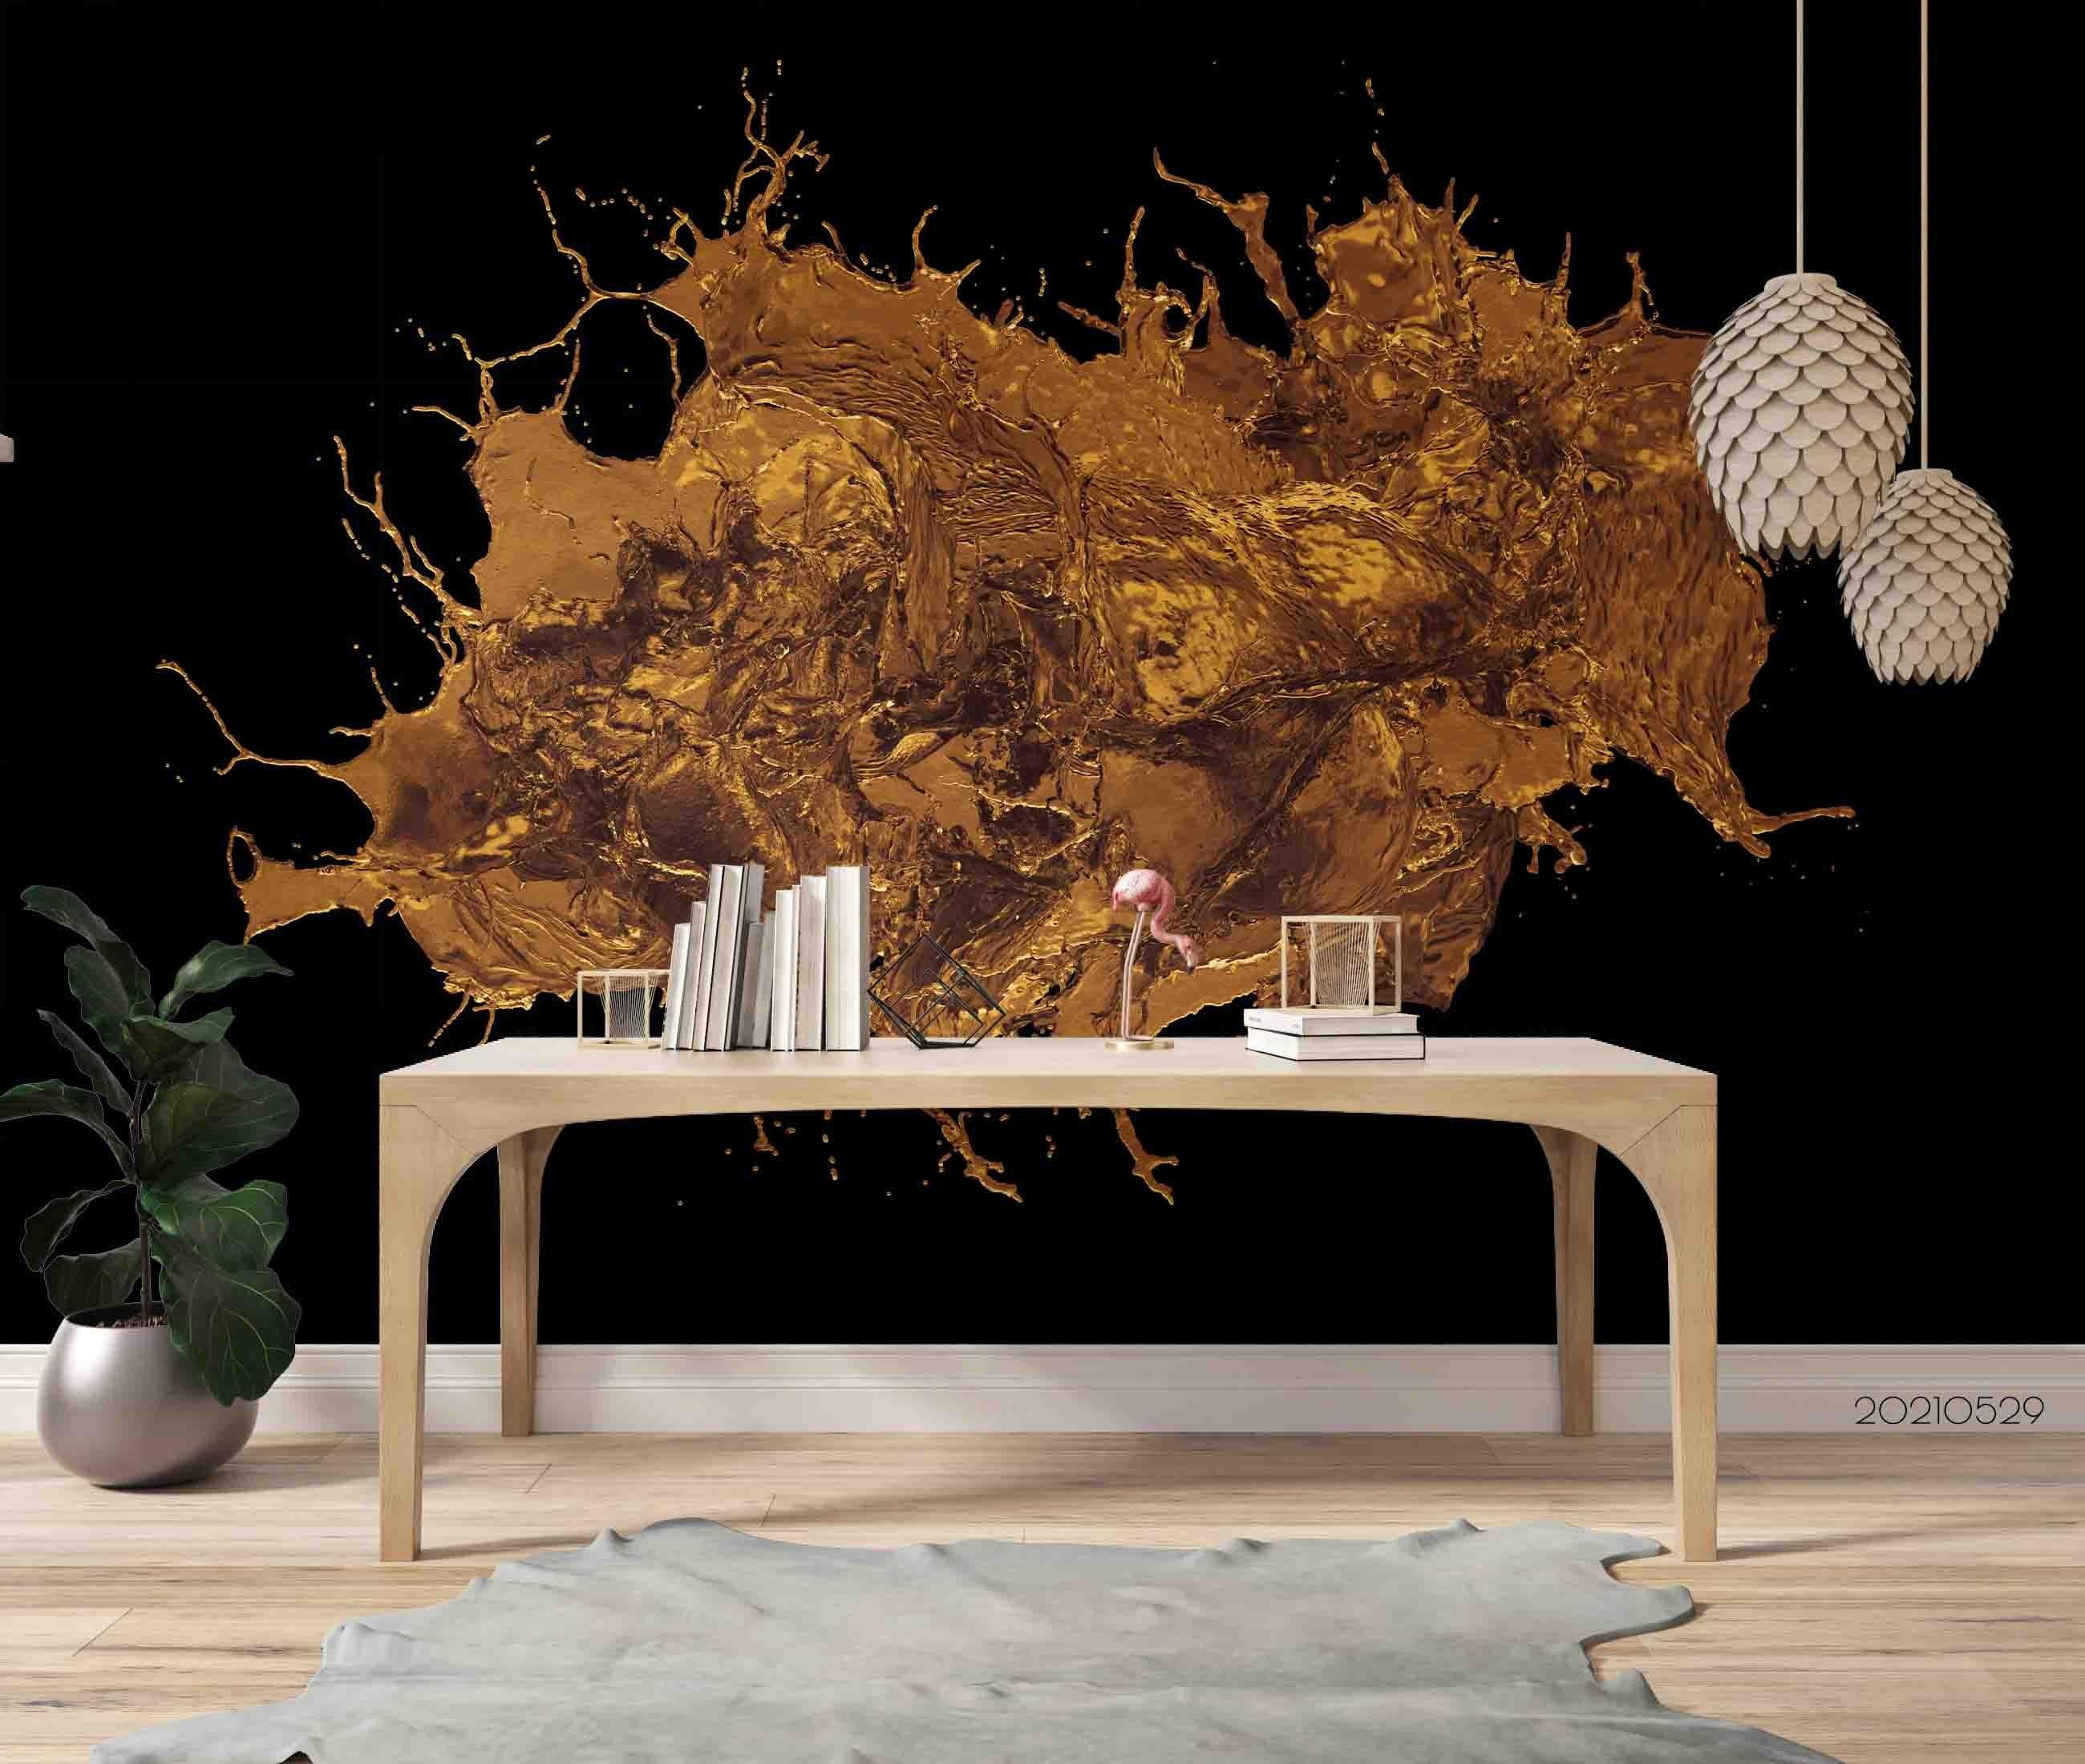 3D Abstract Golden Spraying Black Background Wall Mural Wallpaper SWW542